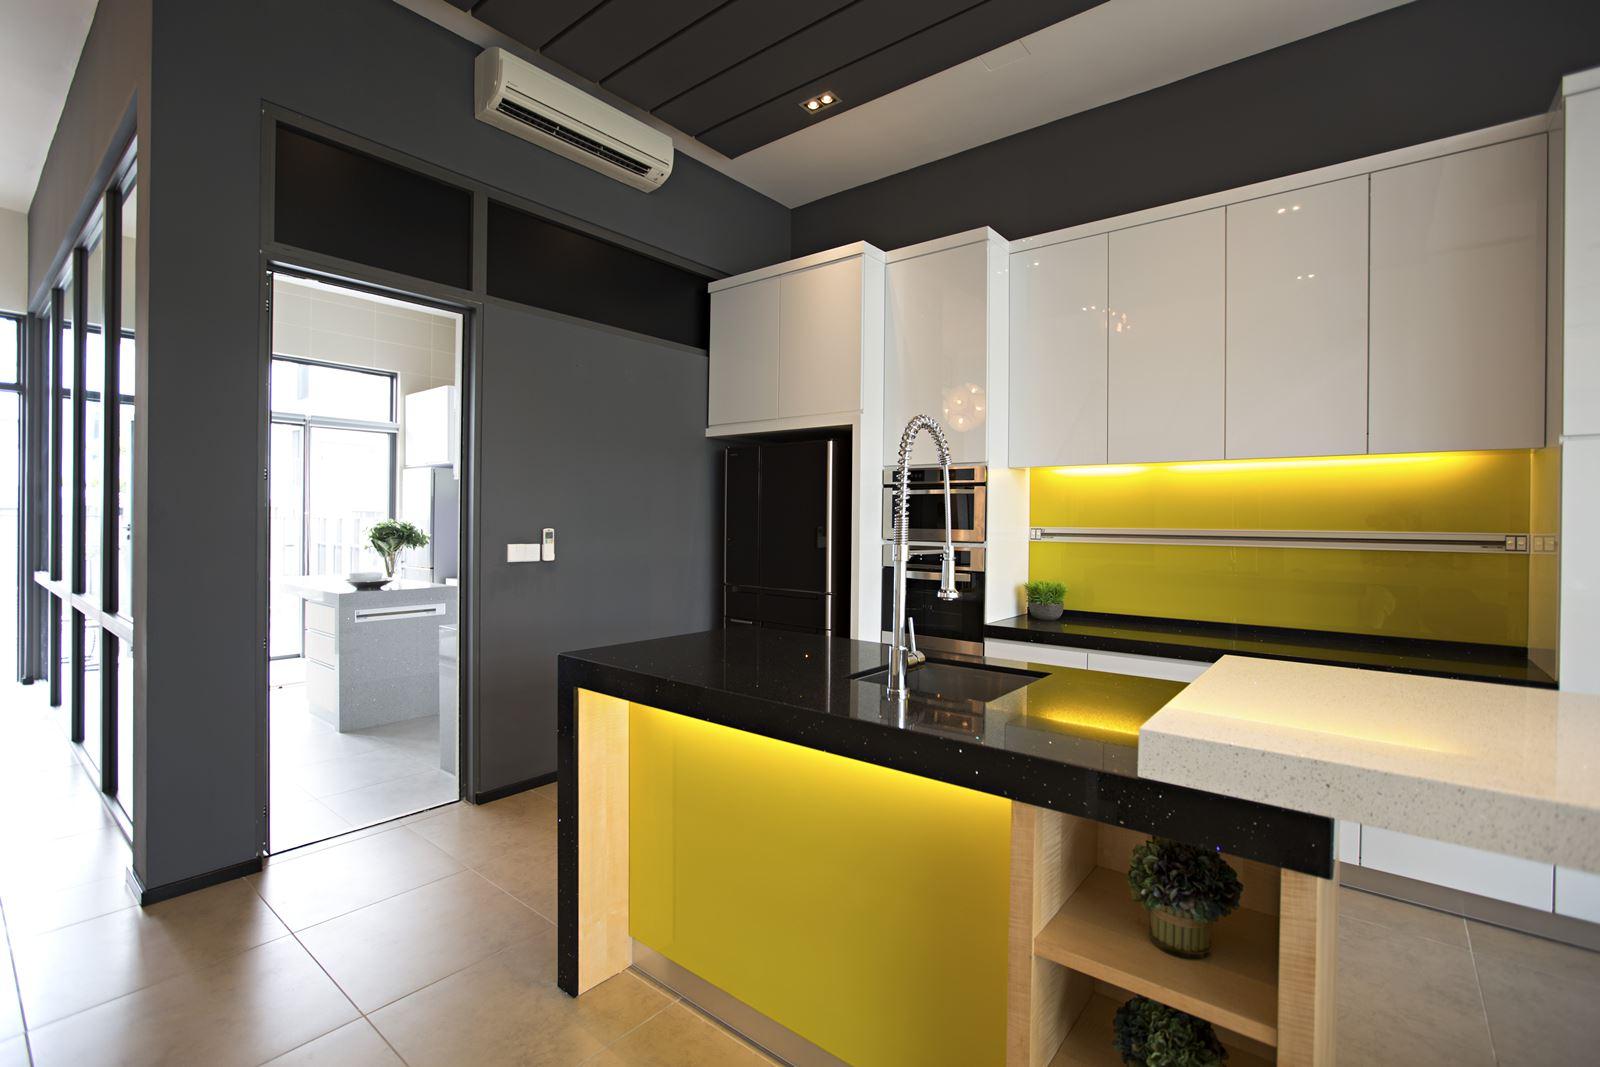 Stylish And Modern Dry Kitchen Design By Turn Interior TDi